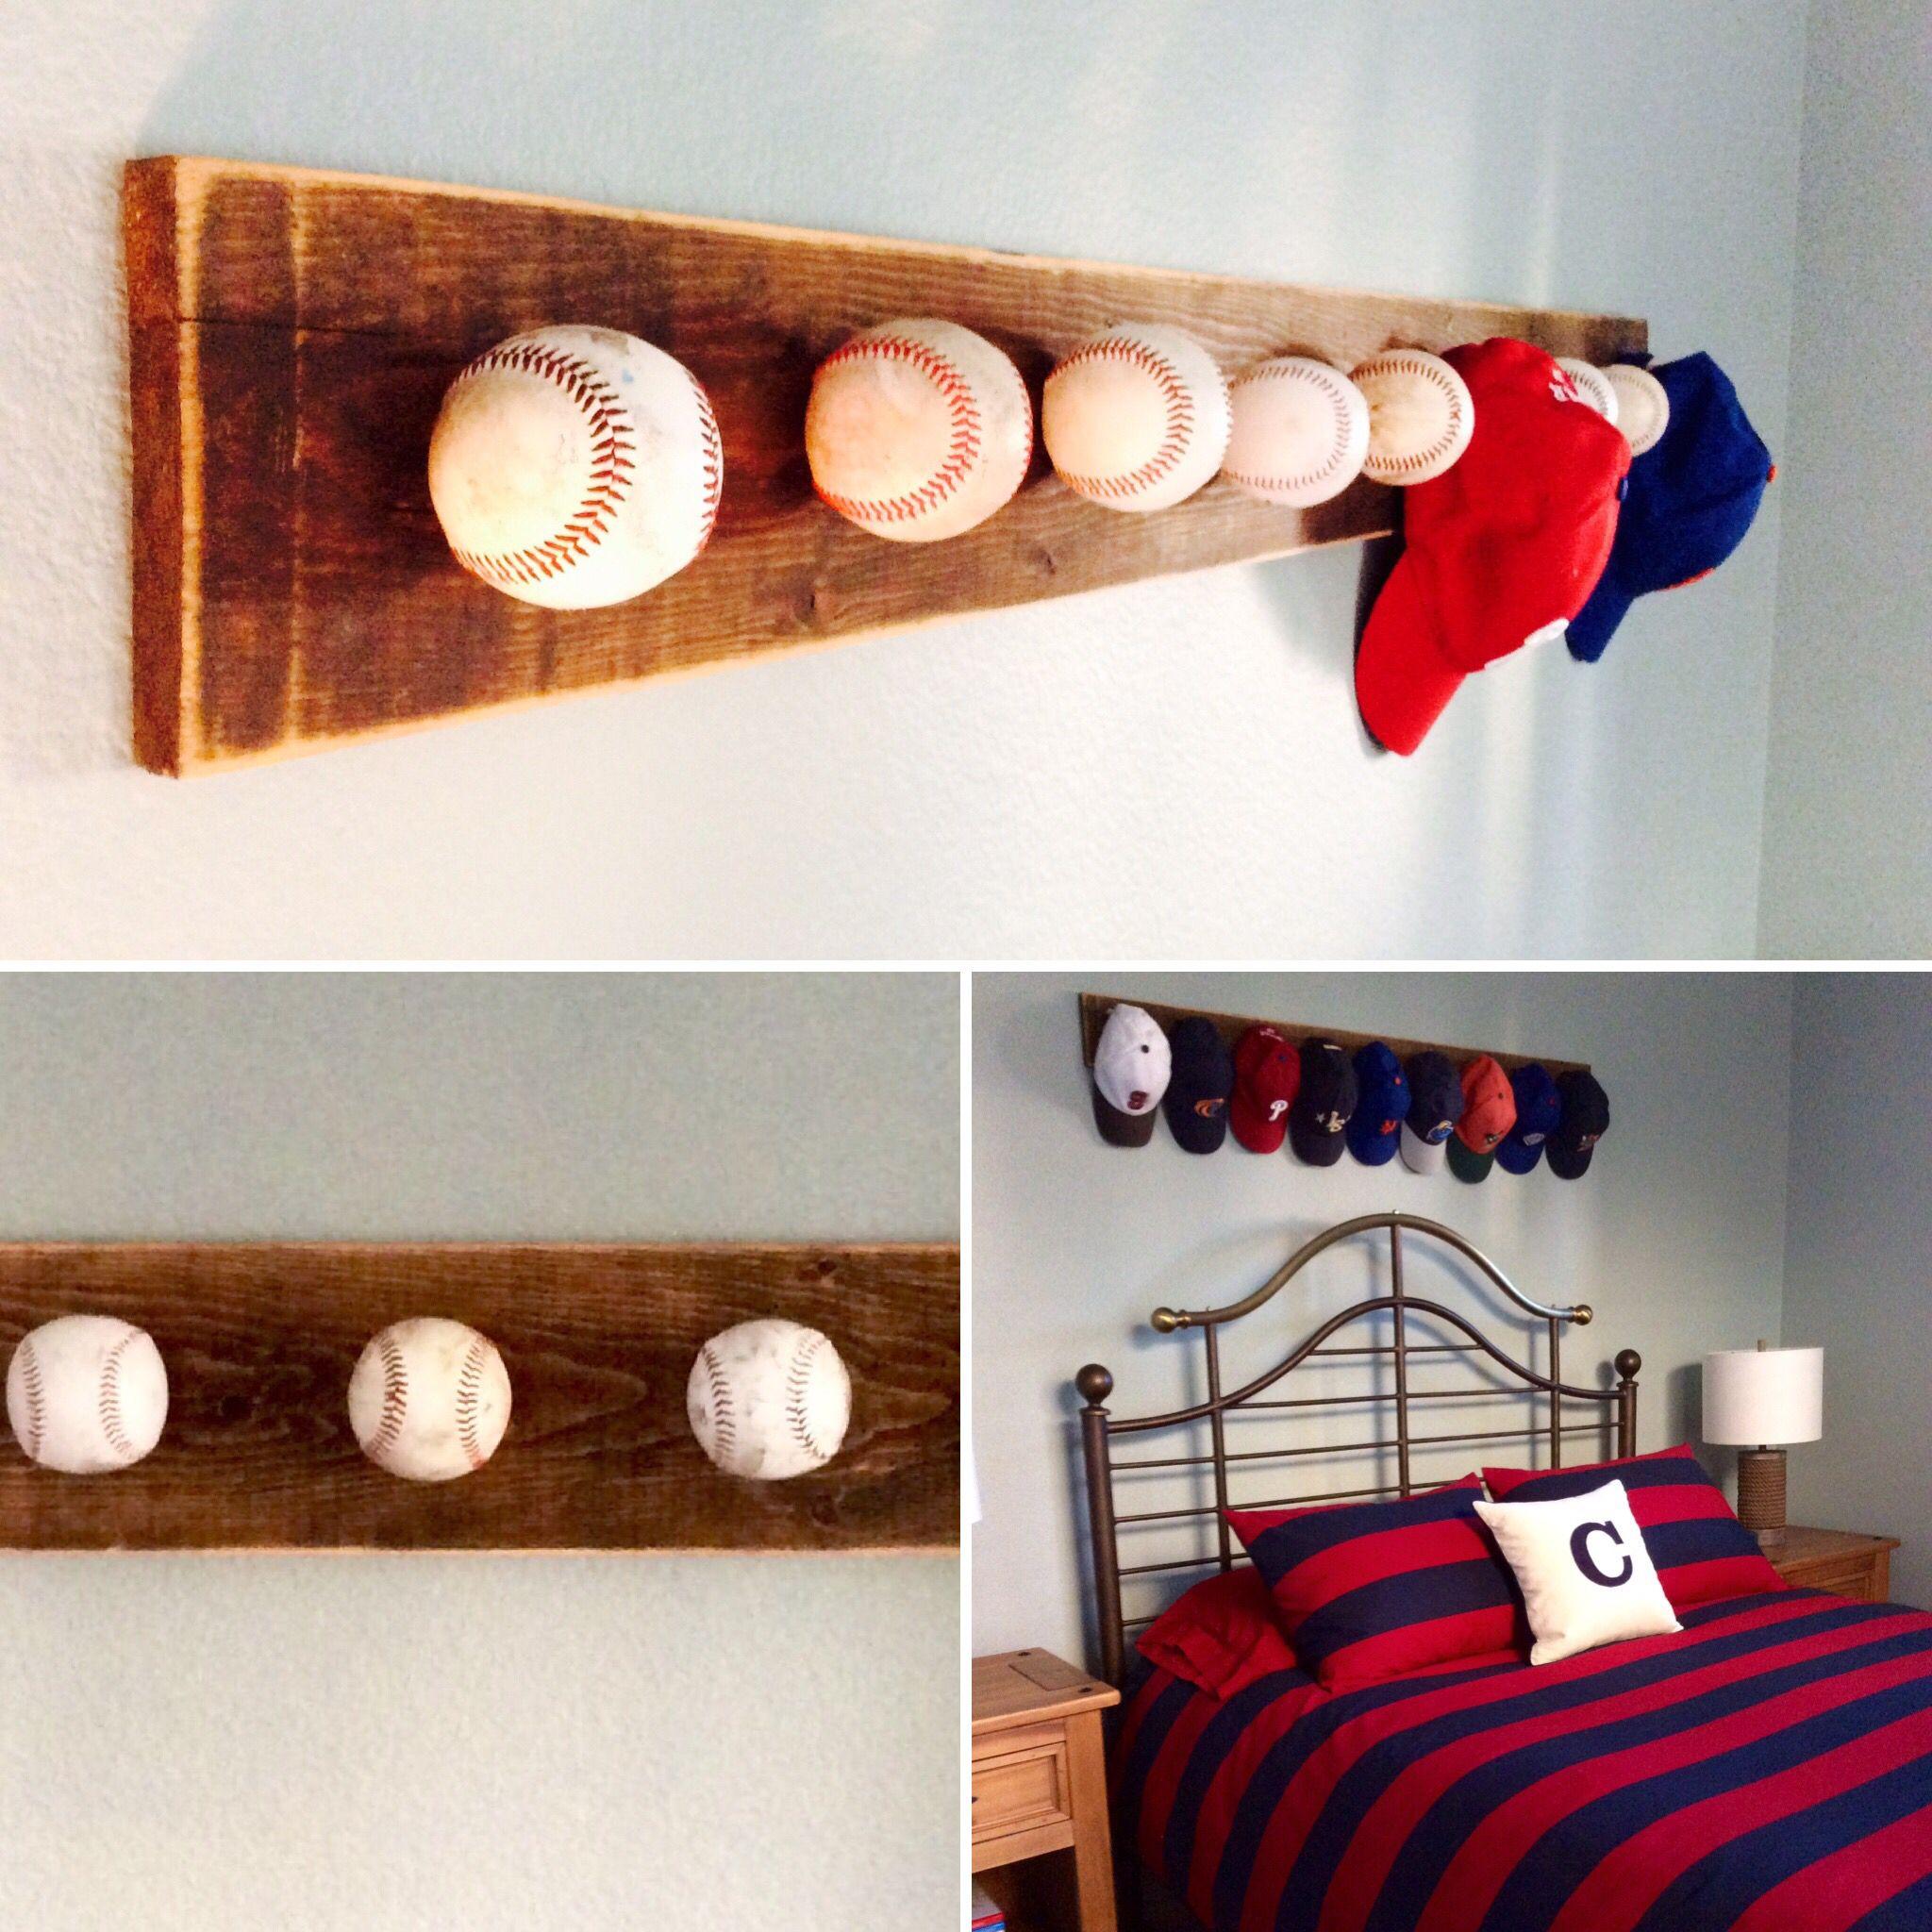 Custom Baseball Hat Rack By The Created Sign Creative Way To Display Baseball Hats Using Old Baseballs And Reclaimed Baseball Bedroom Baseball Room Rack Ideas